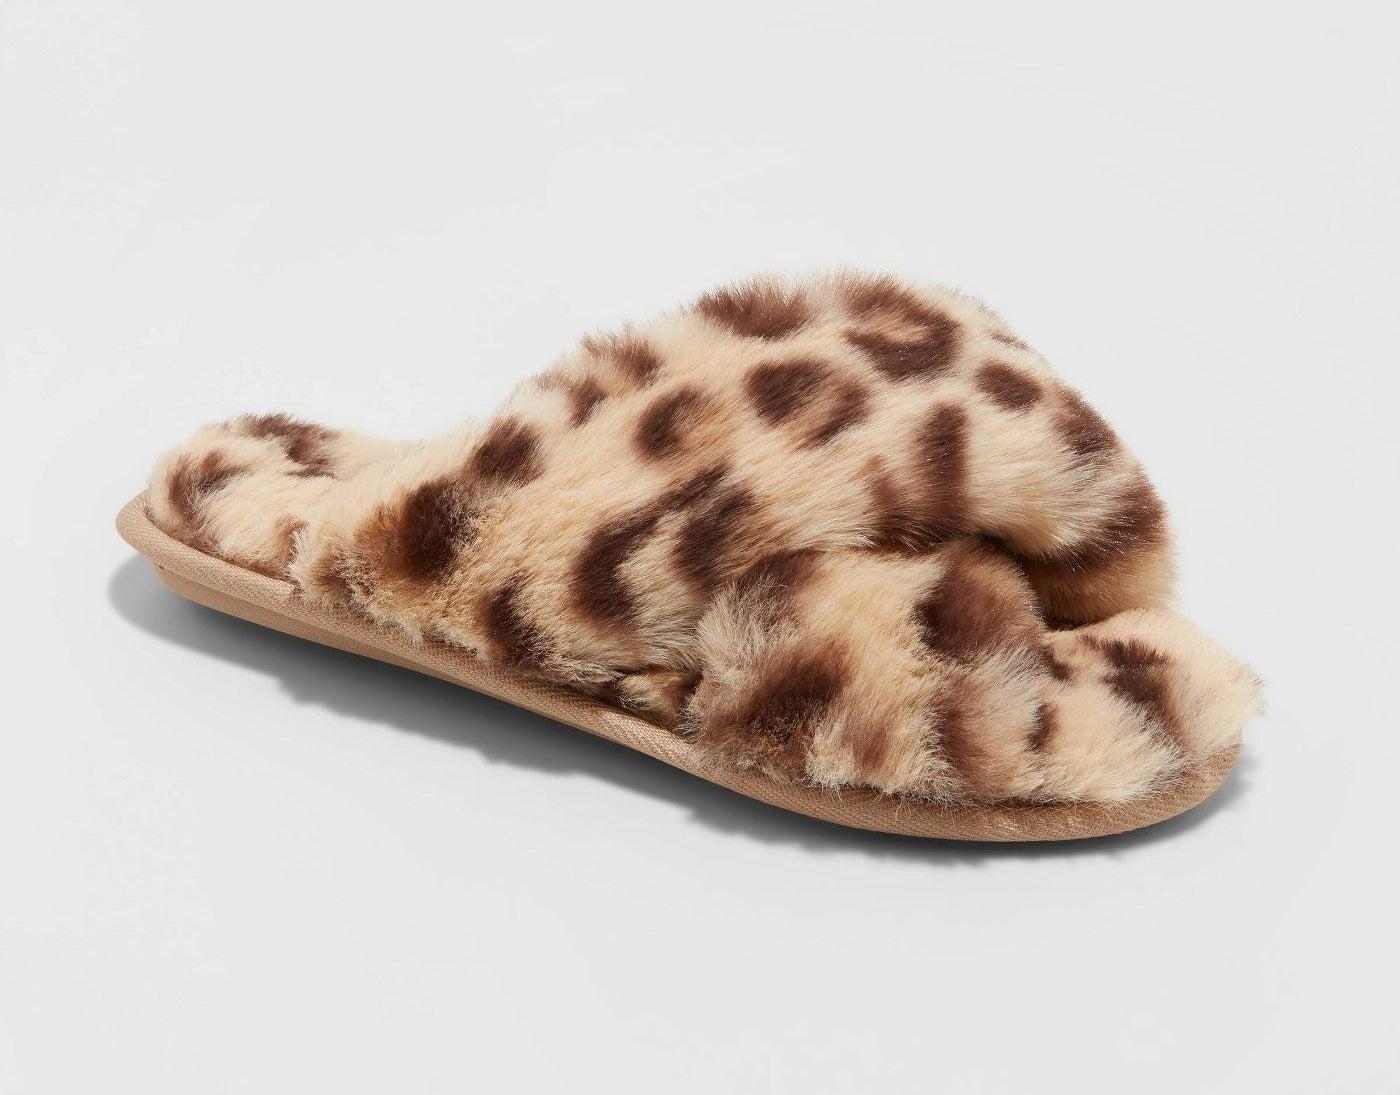 Leopard print fuzzy slippers